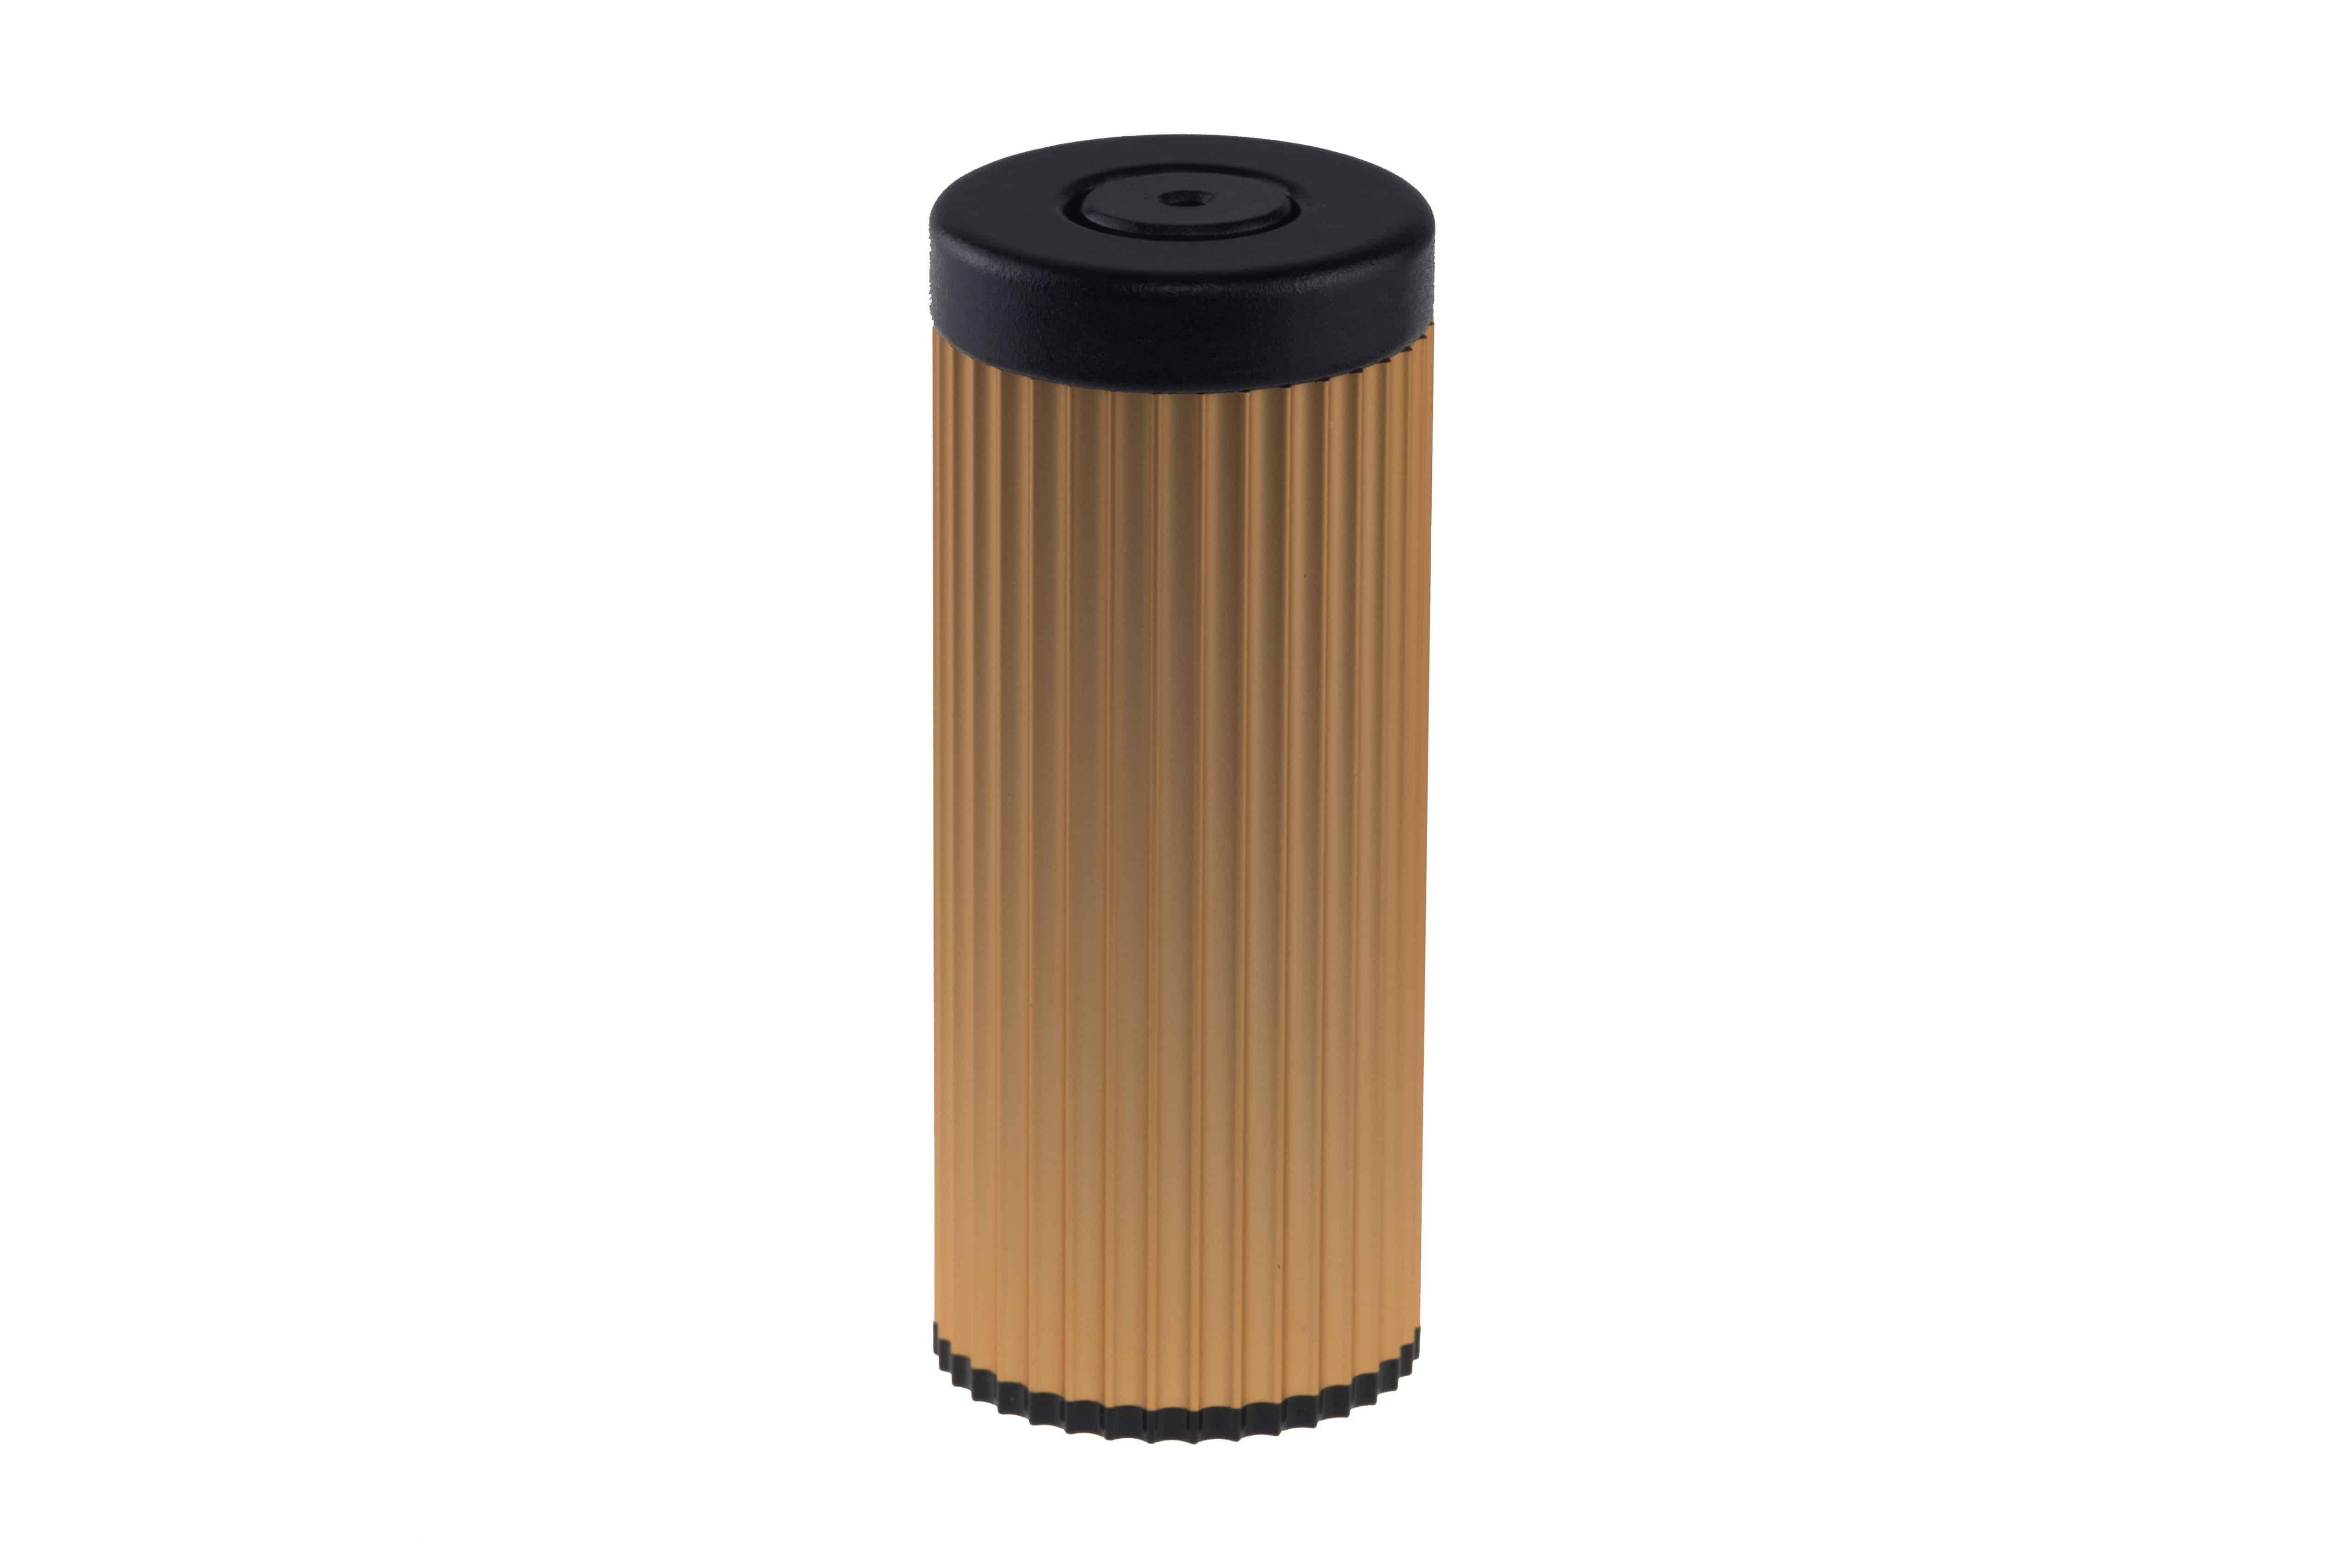 Copper Black Image